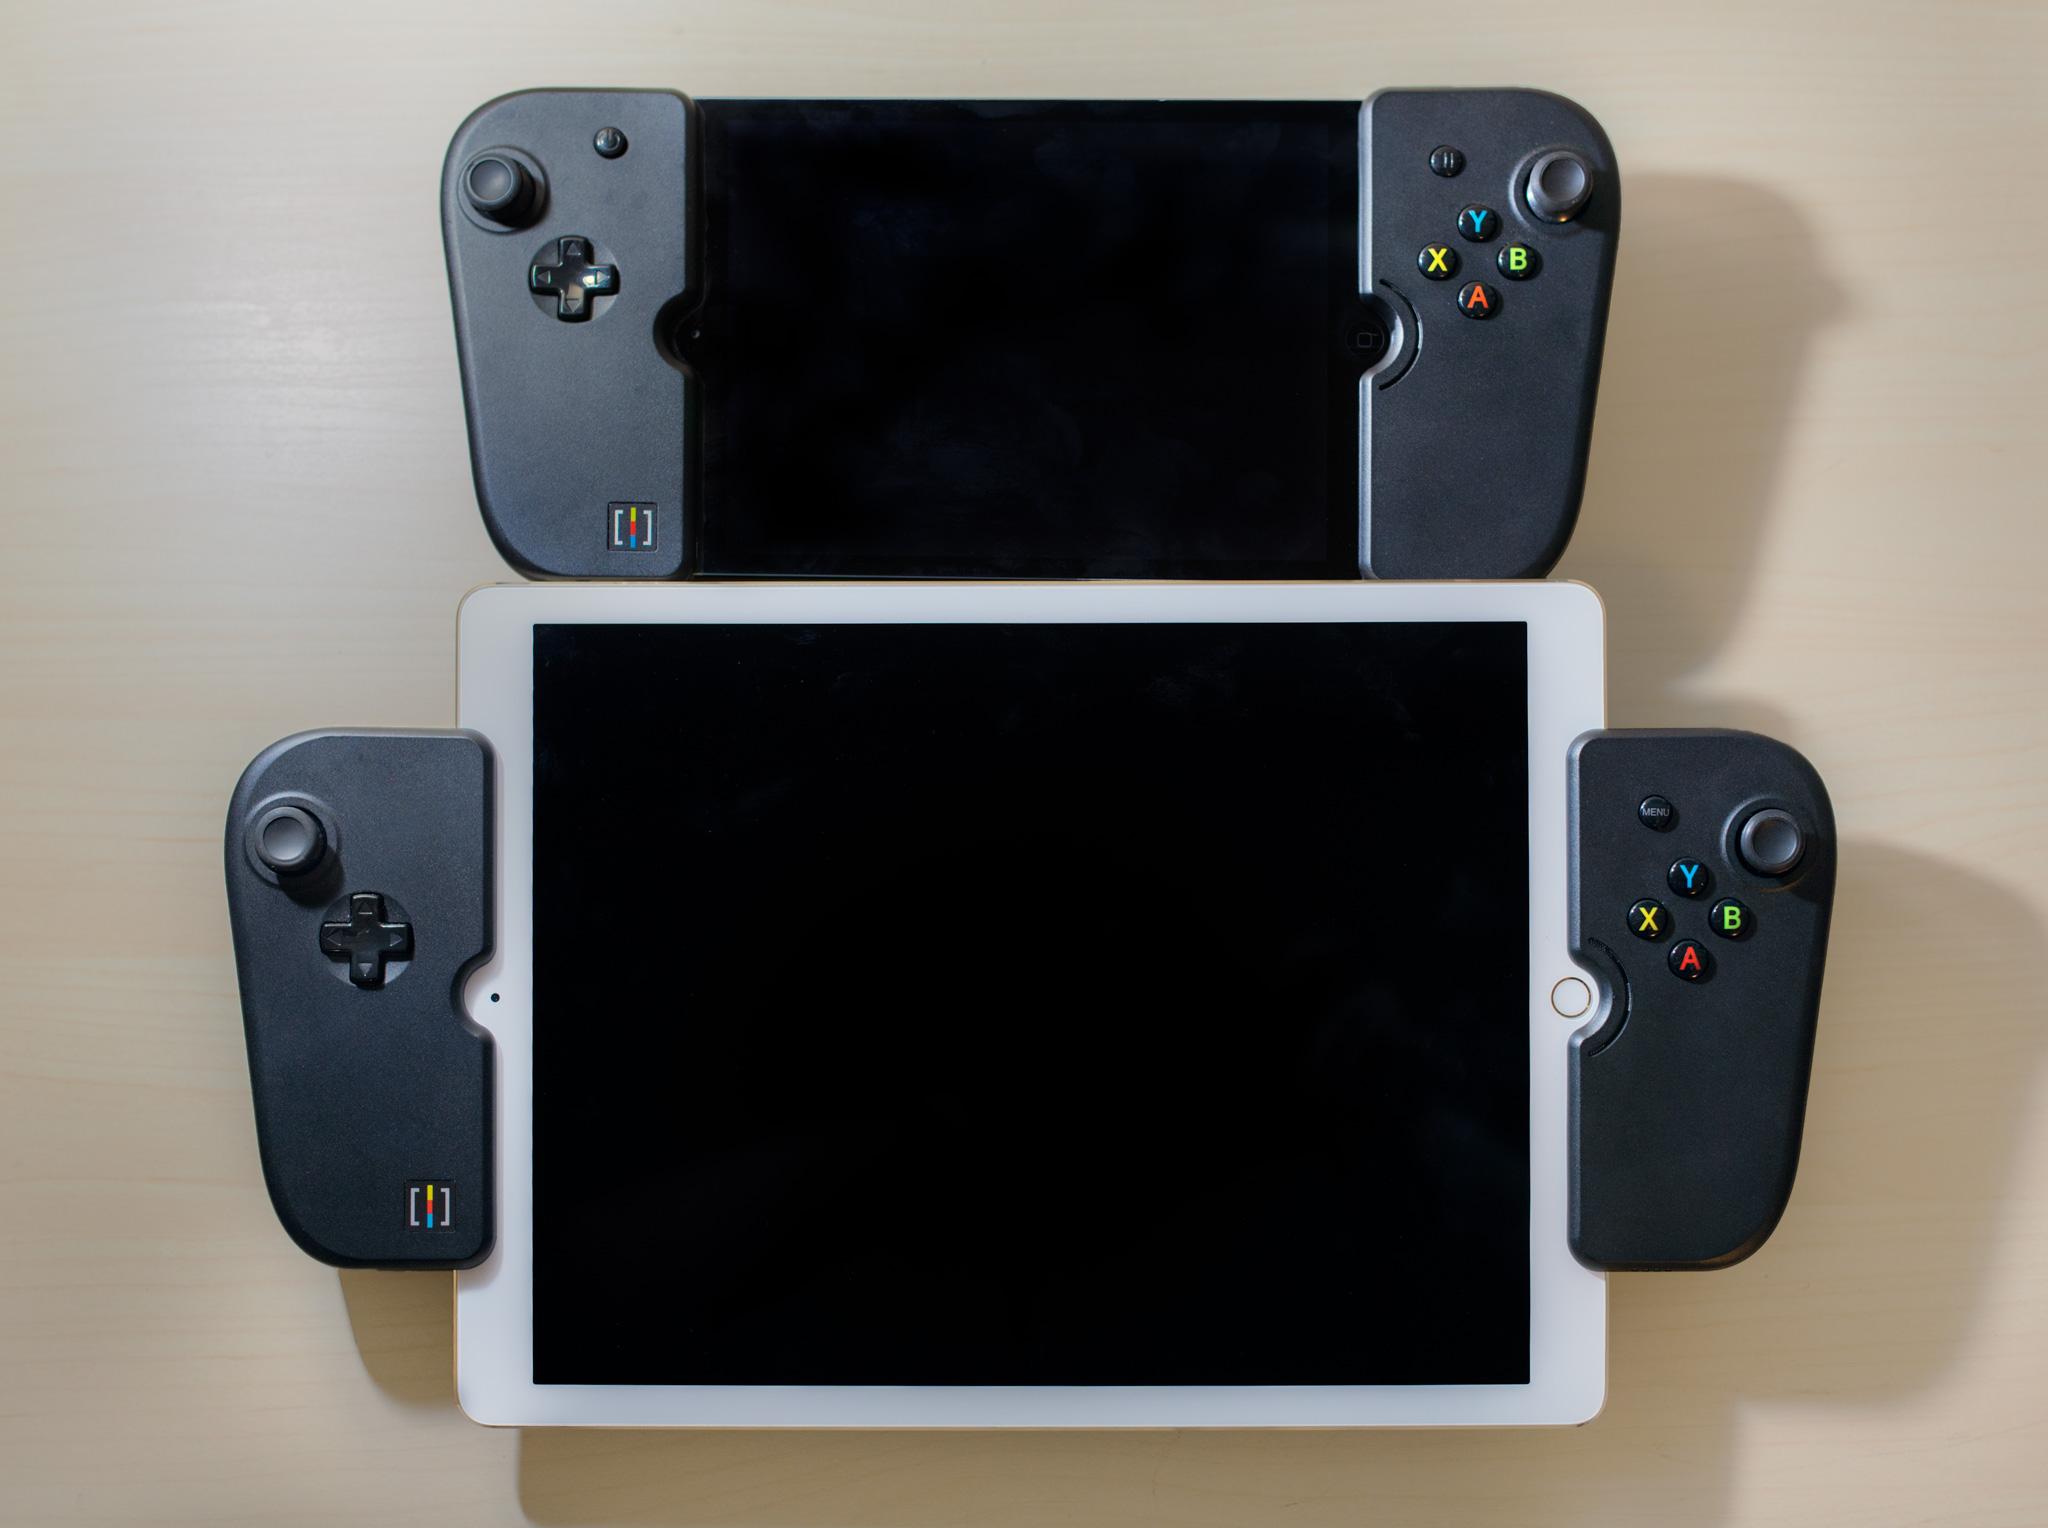 iPad Pro Gamevice VS iPad Mini Gamevice